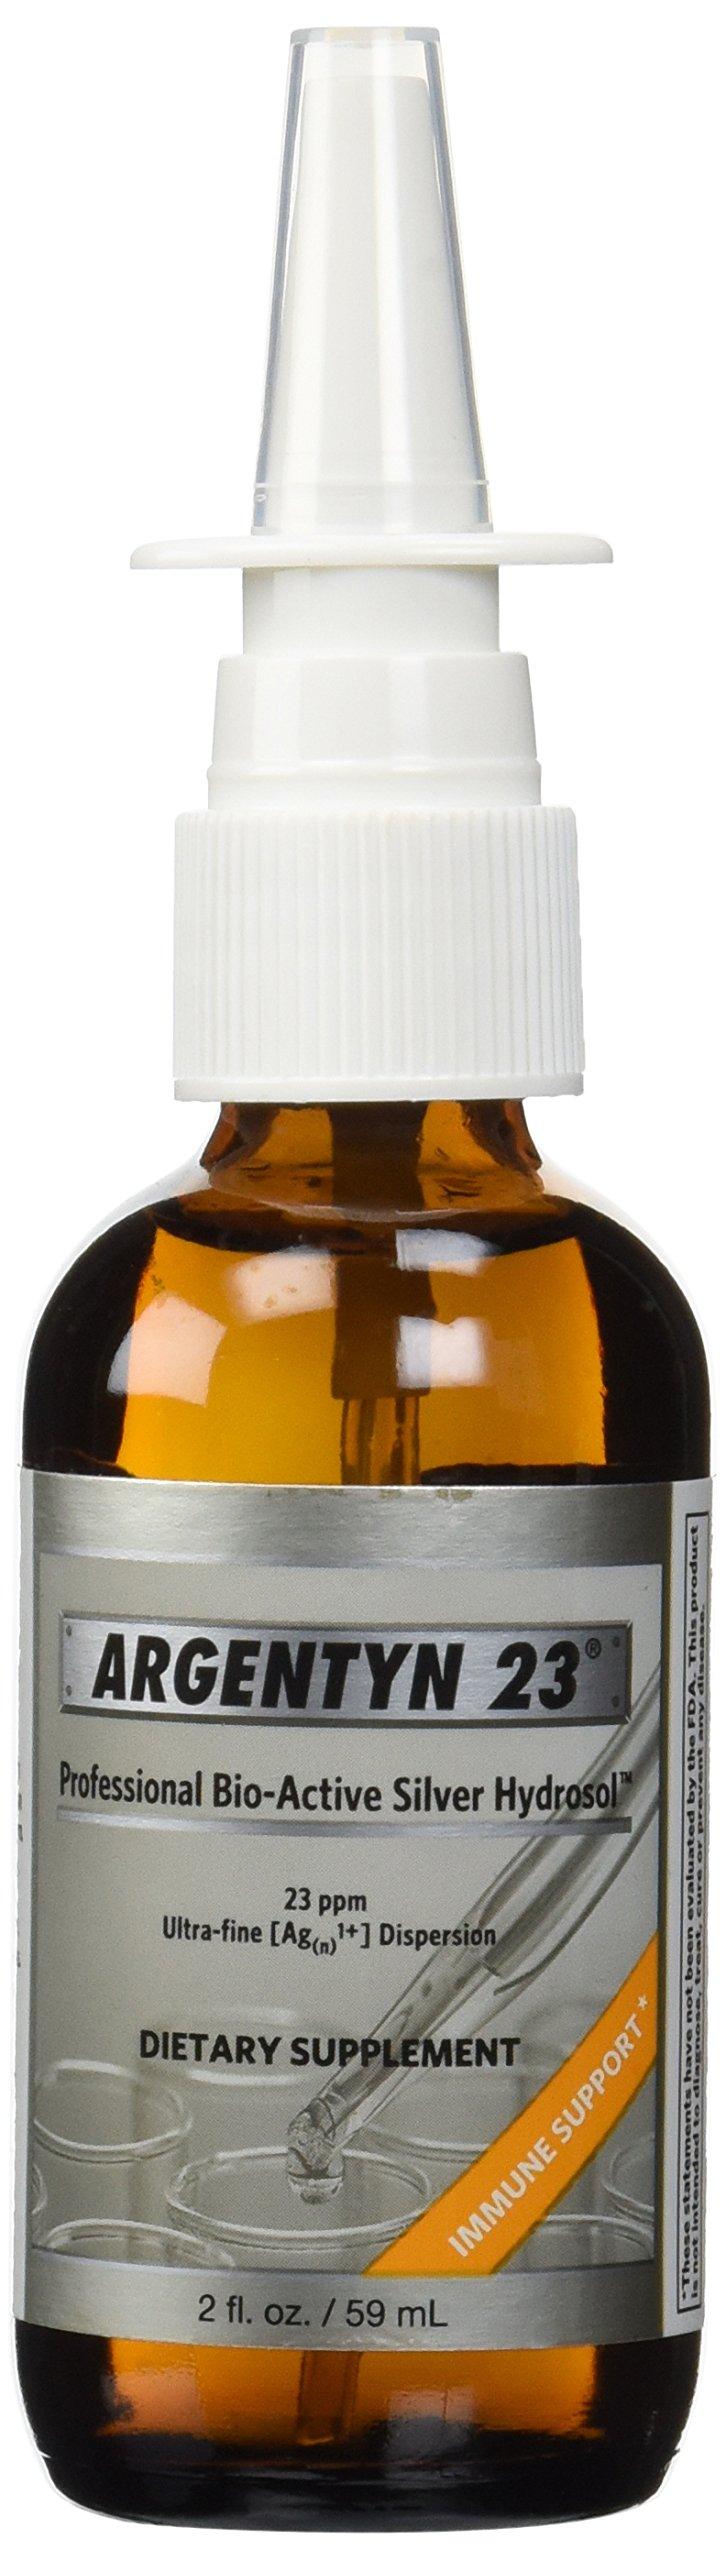 Argentyn 23 Professional Bioactive Silver Hydrosol 23 PPM Vertical Spray, 2 Ounce